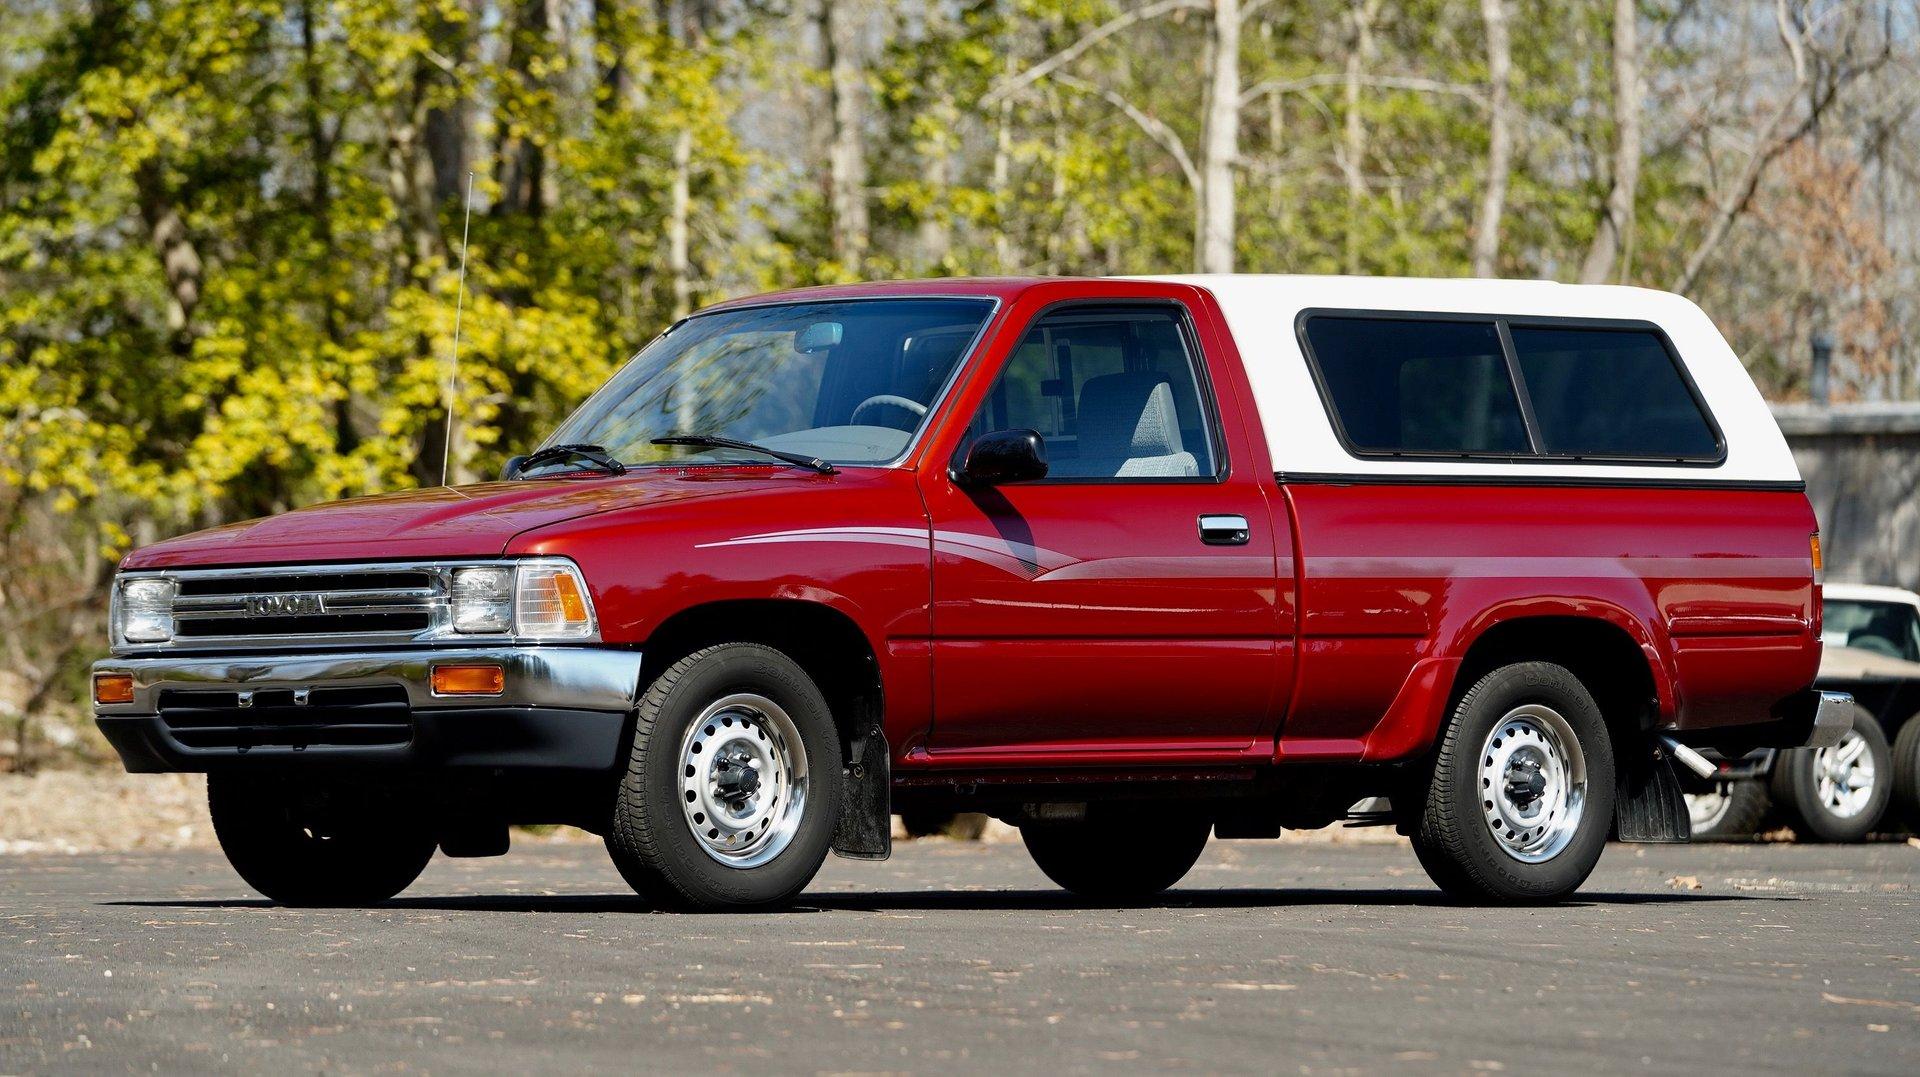 1991 toyota tacoma pick up